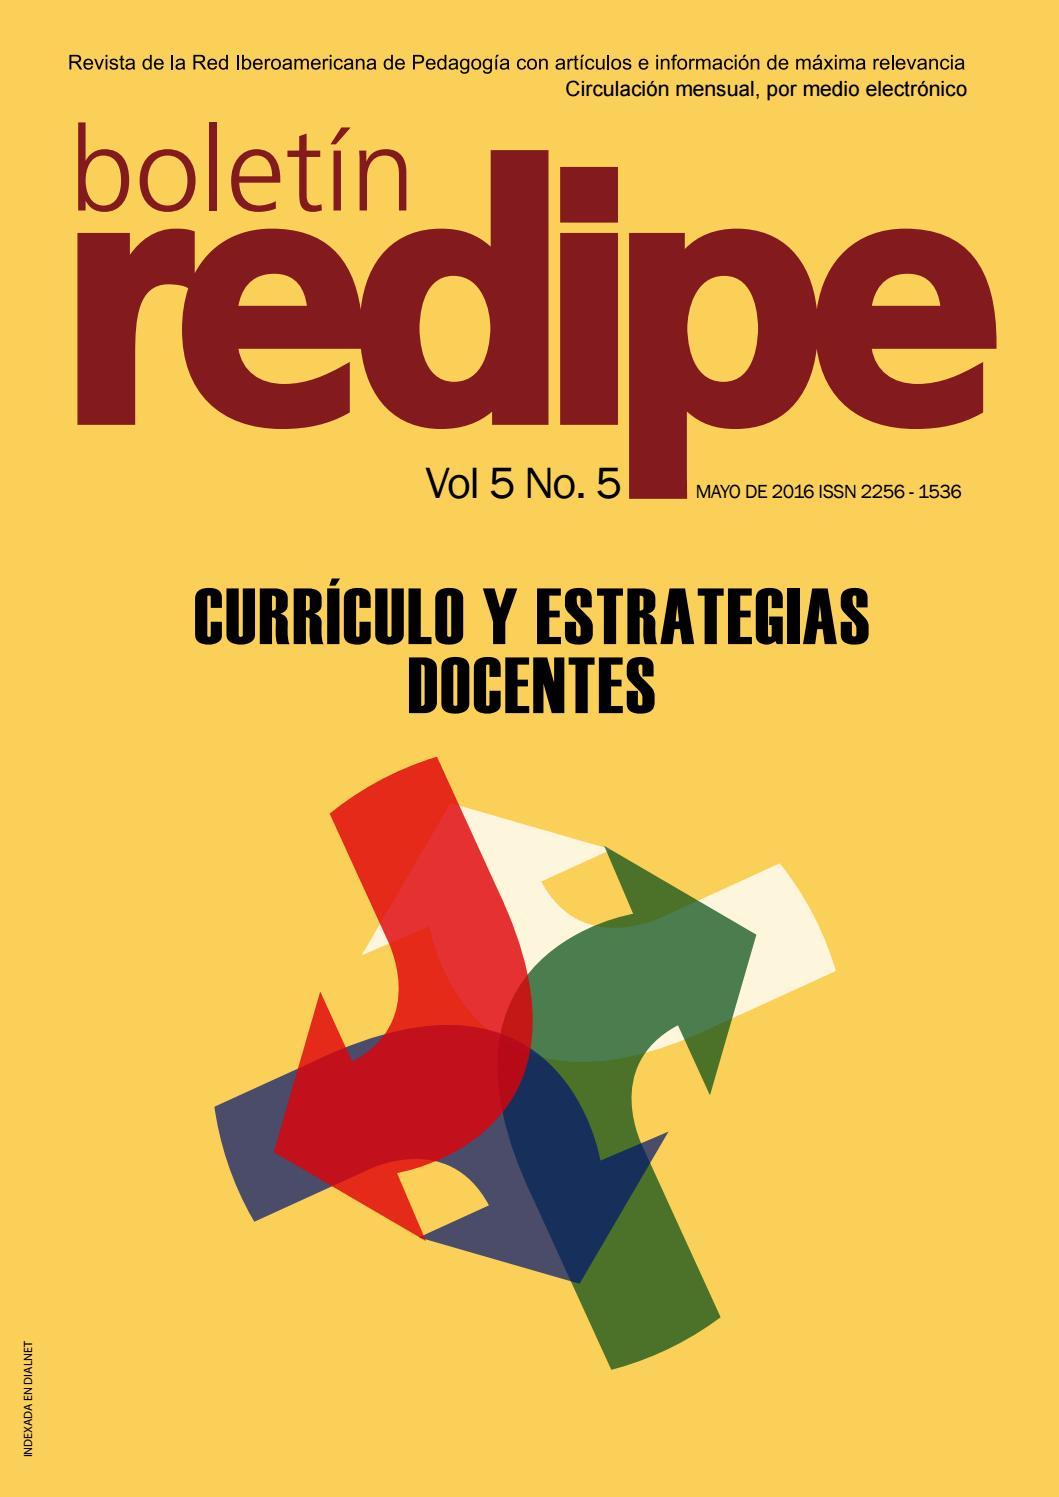 Boletin Redipe Vol5 Ed5 by REDIPE - issuu